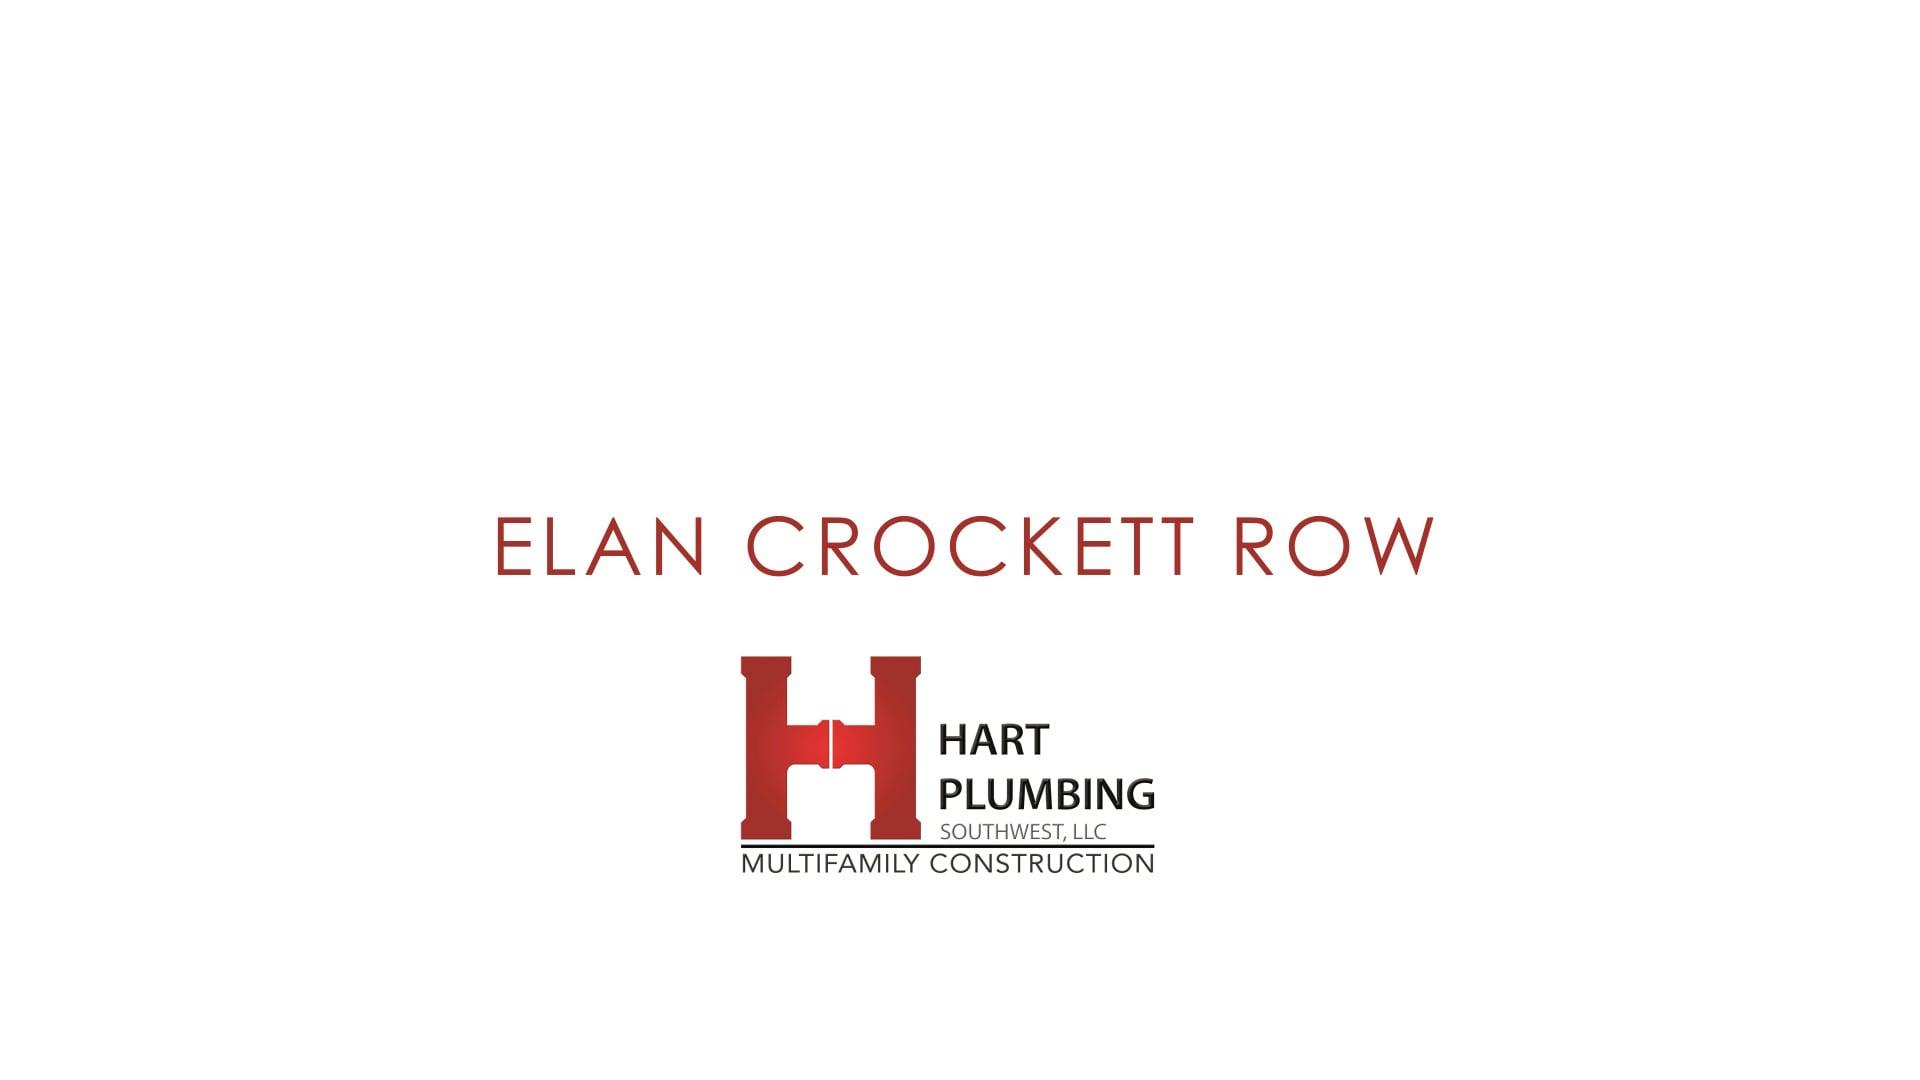 Elan Crockett Row